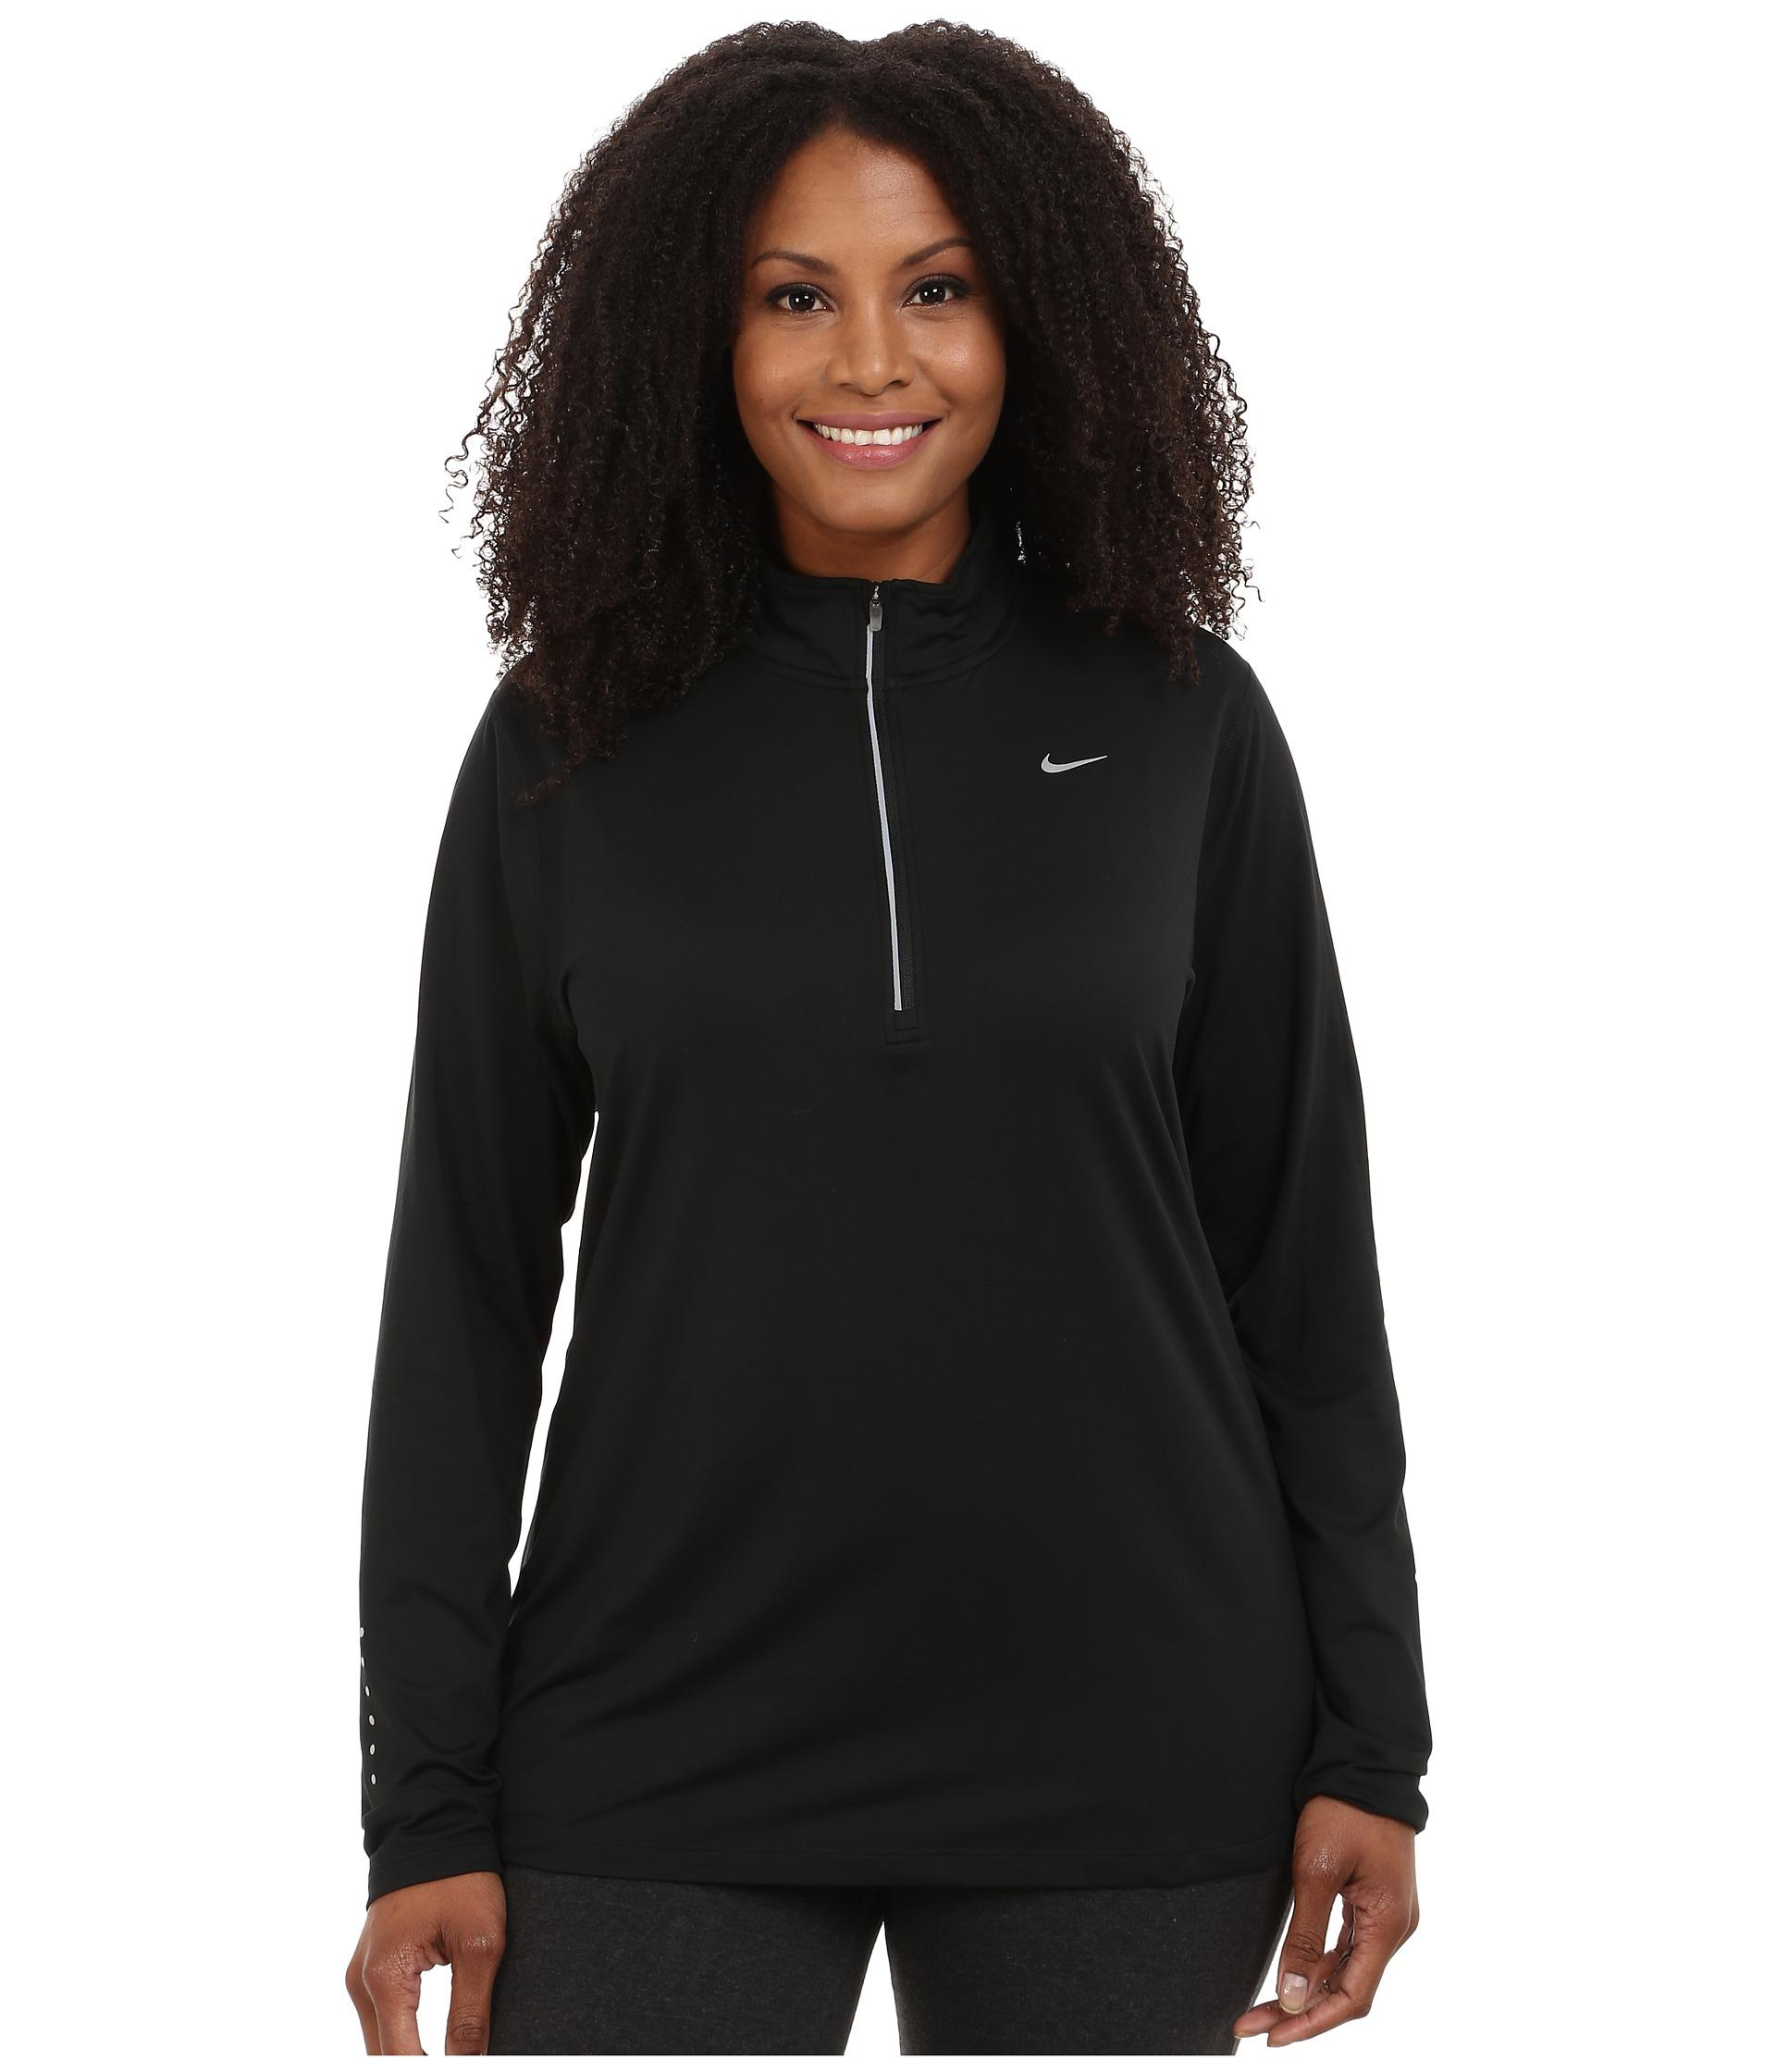 Womens Running Jackets and Coats Clothing